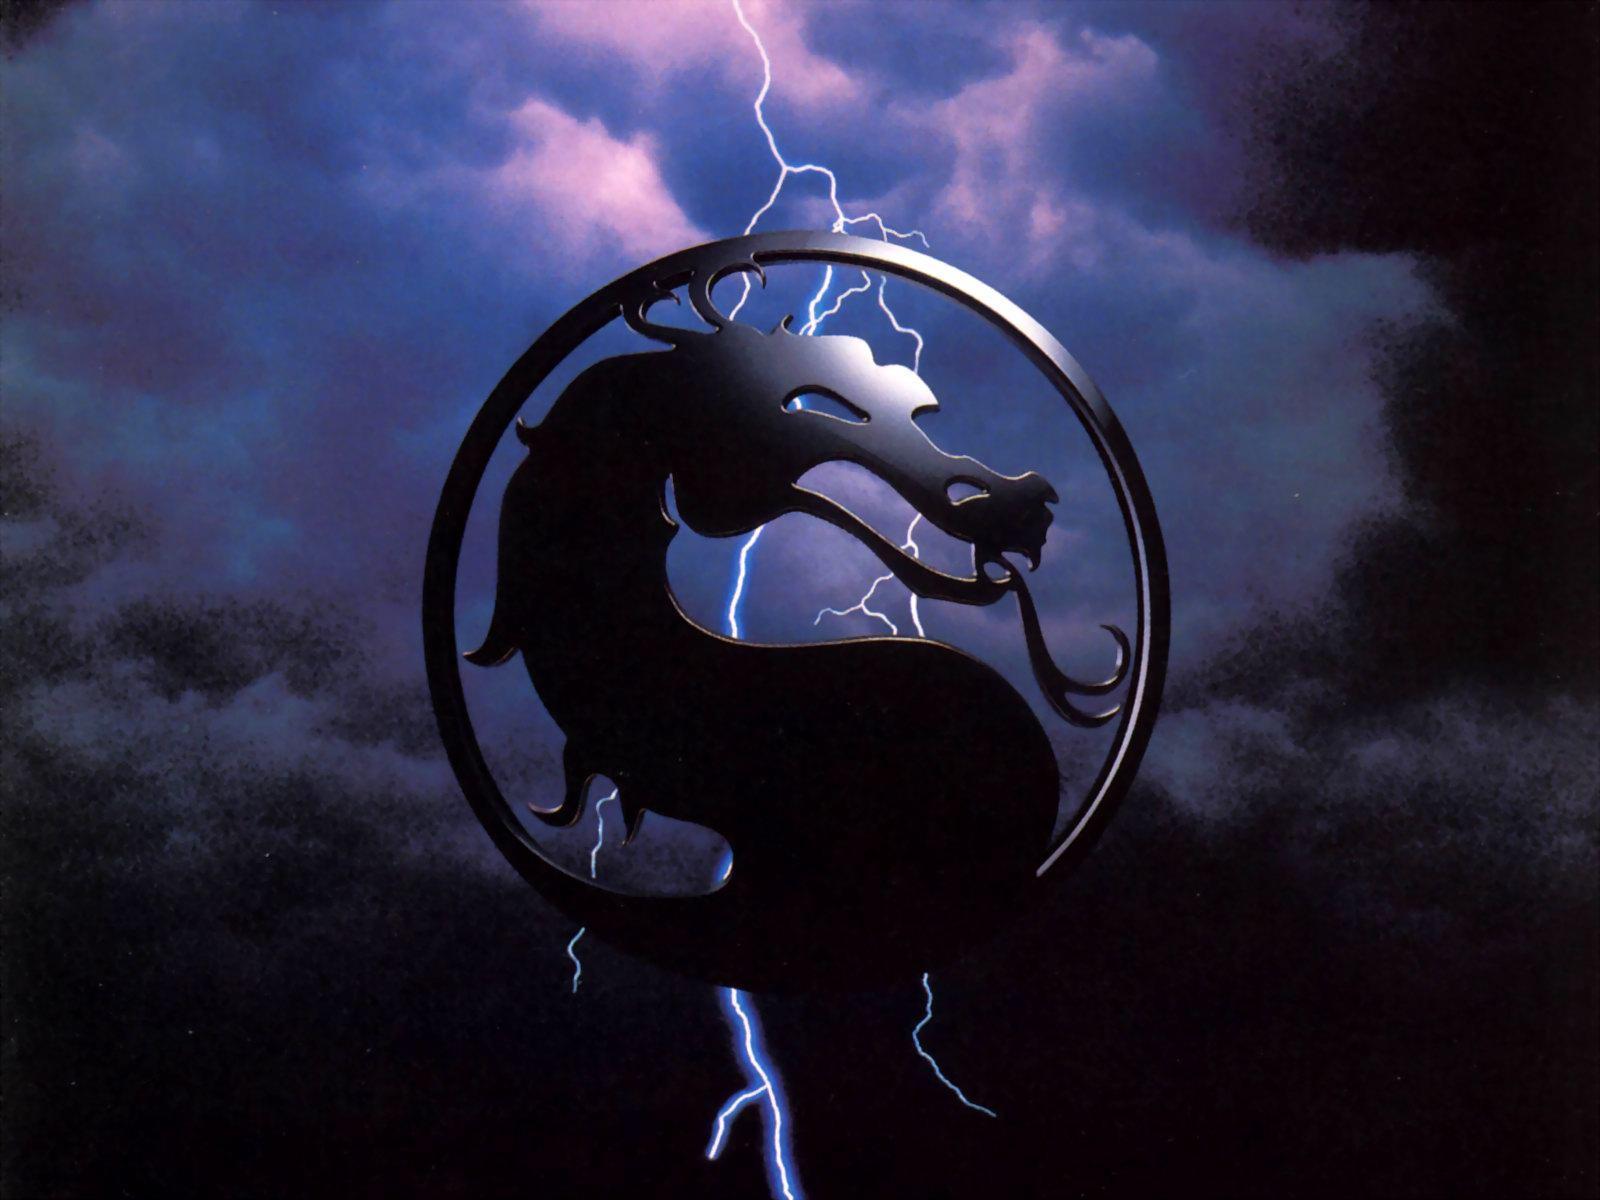 Mortal Kombat Dragon: Mortal Kombat Movie Wallpapers